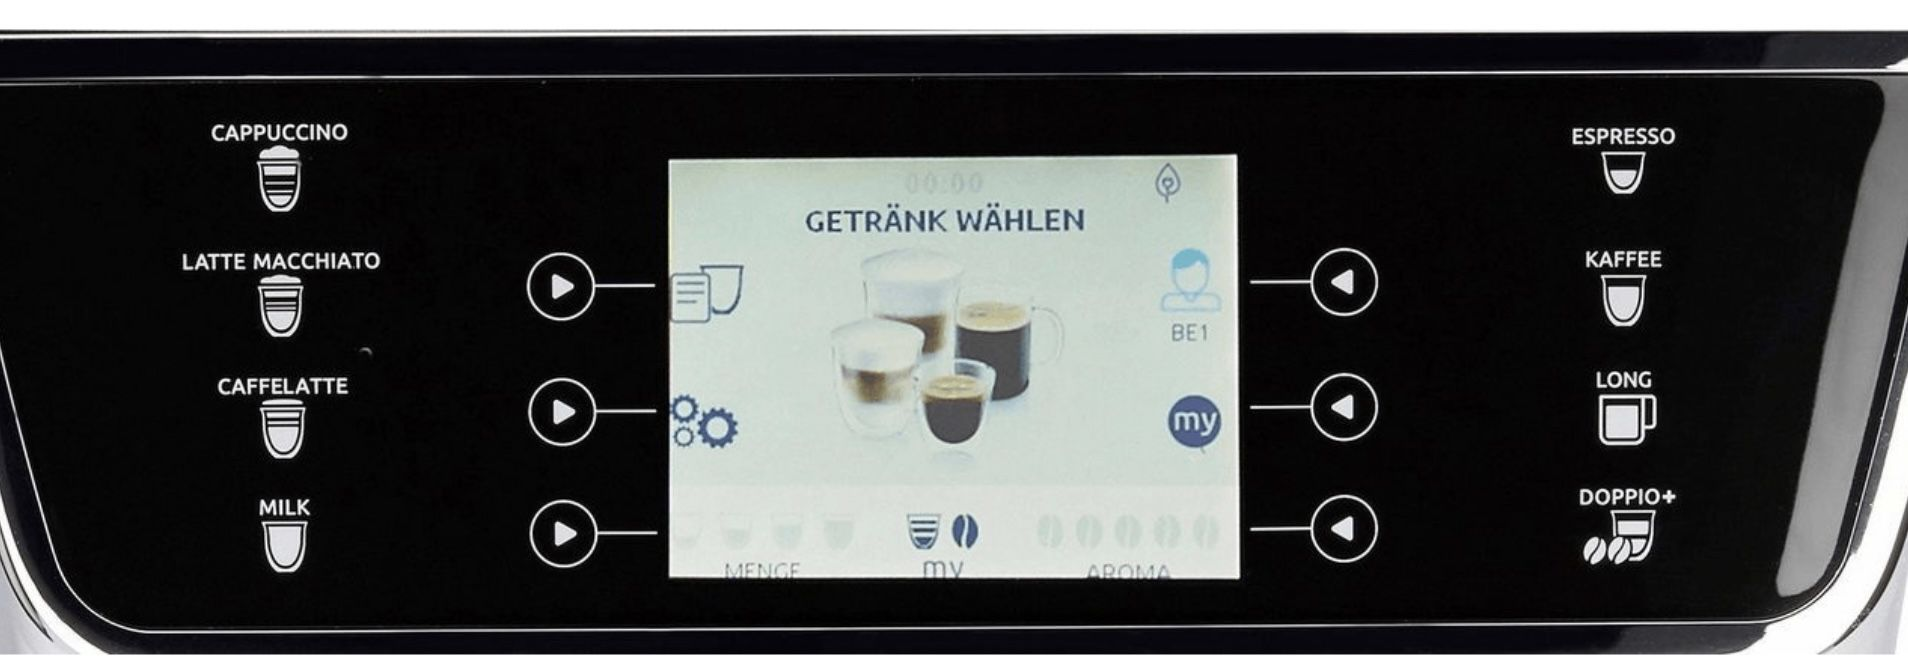 DeLonghi ECAM 656.55.MS PrimaDonna Elite Kaffeevollautomat für 850,91€ (statt neu 1.178€)